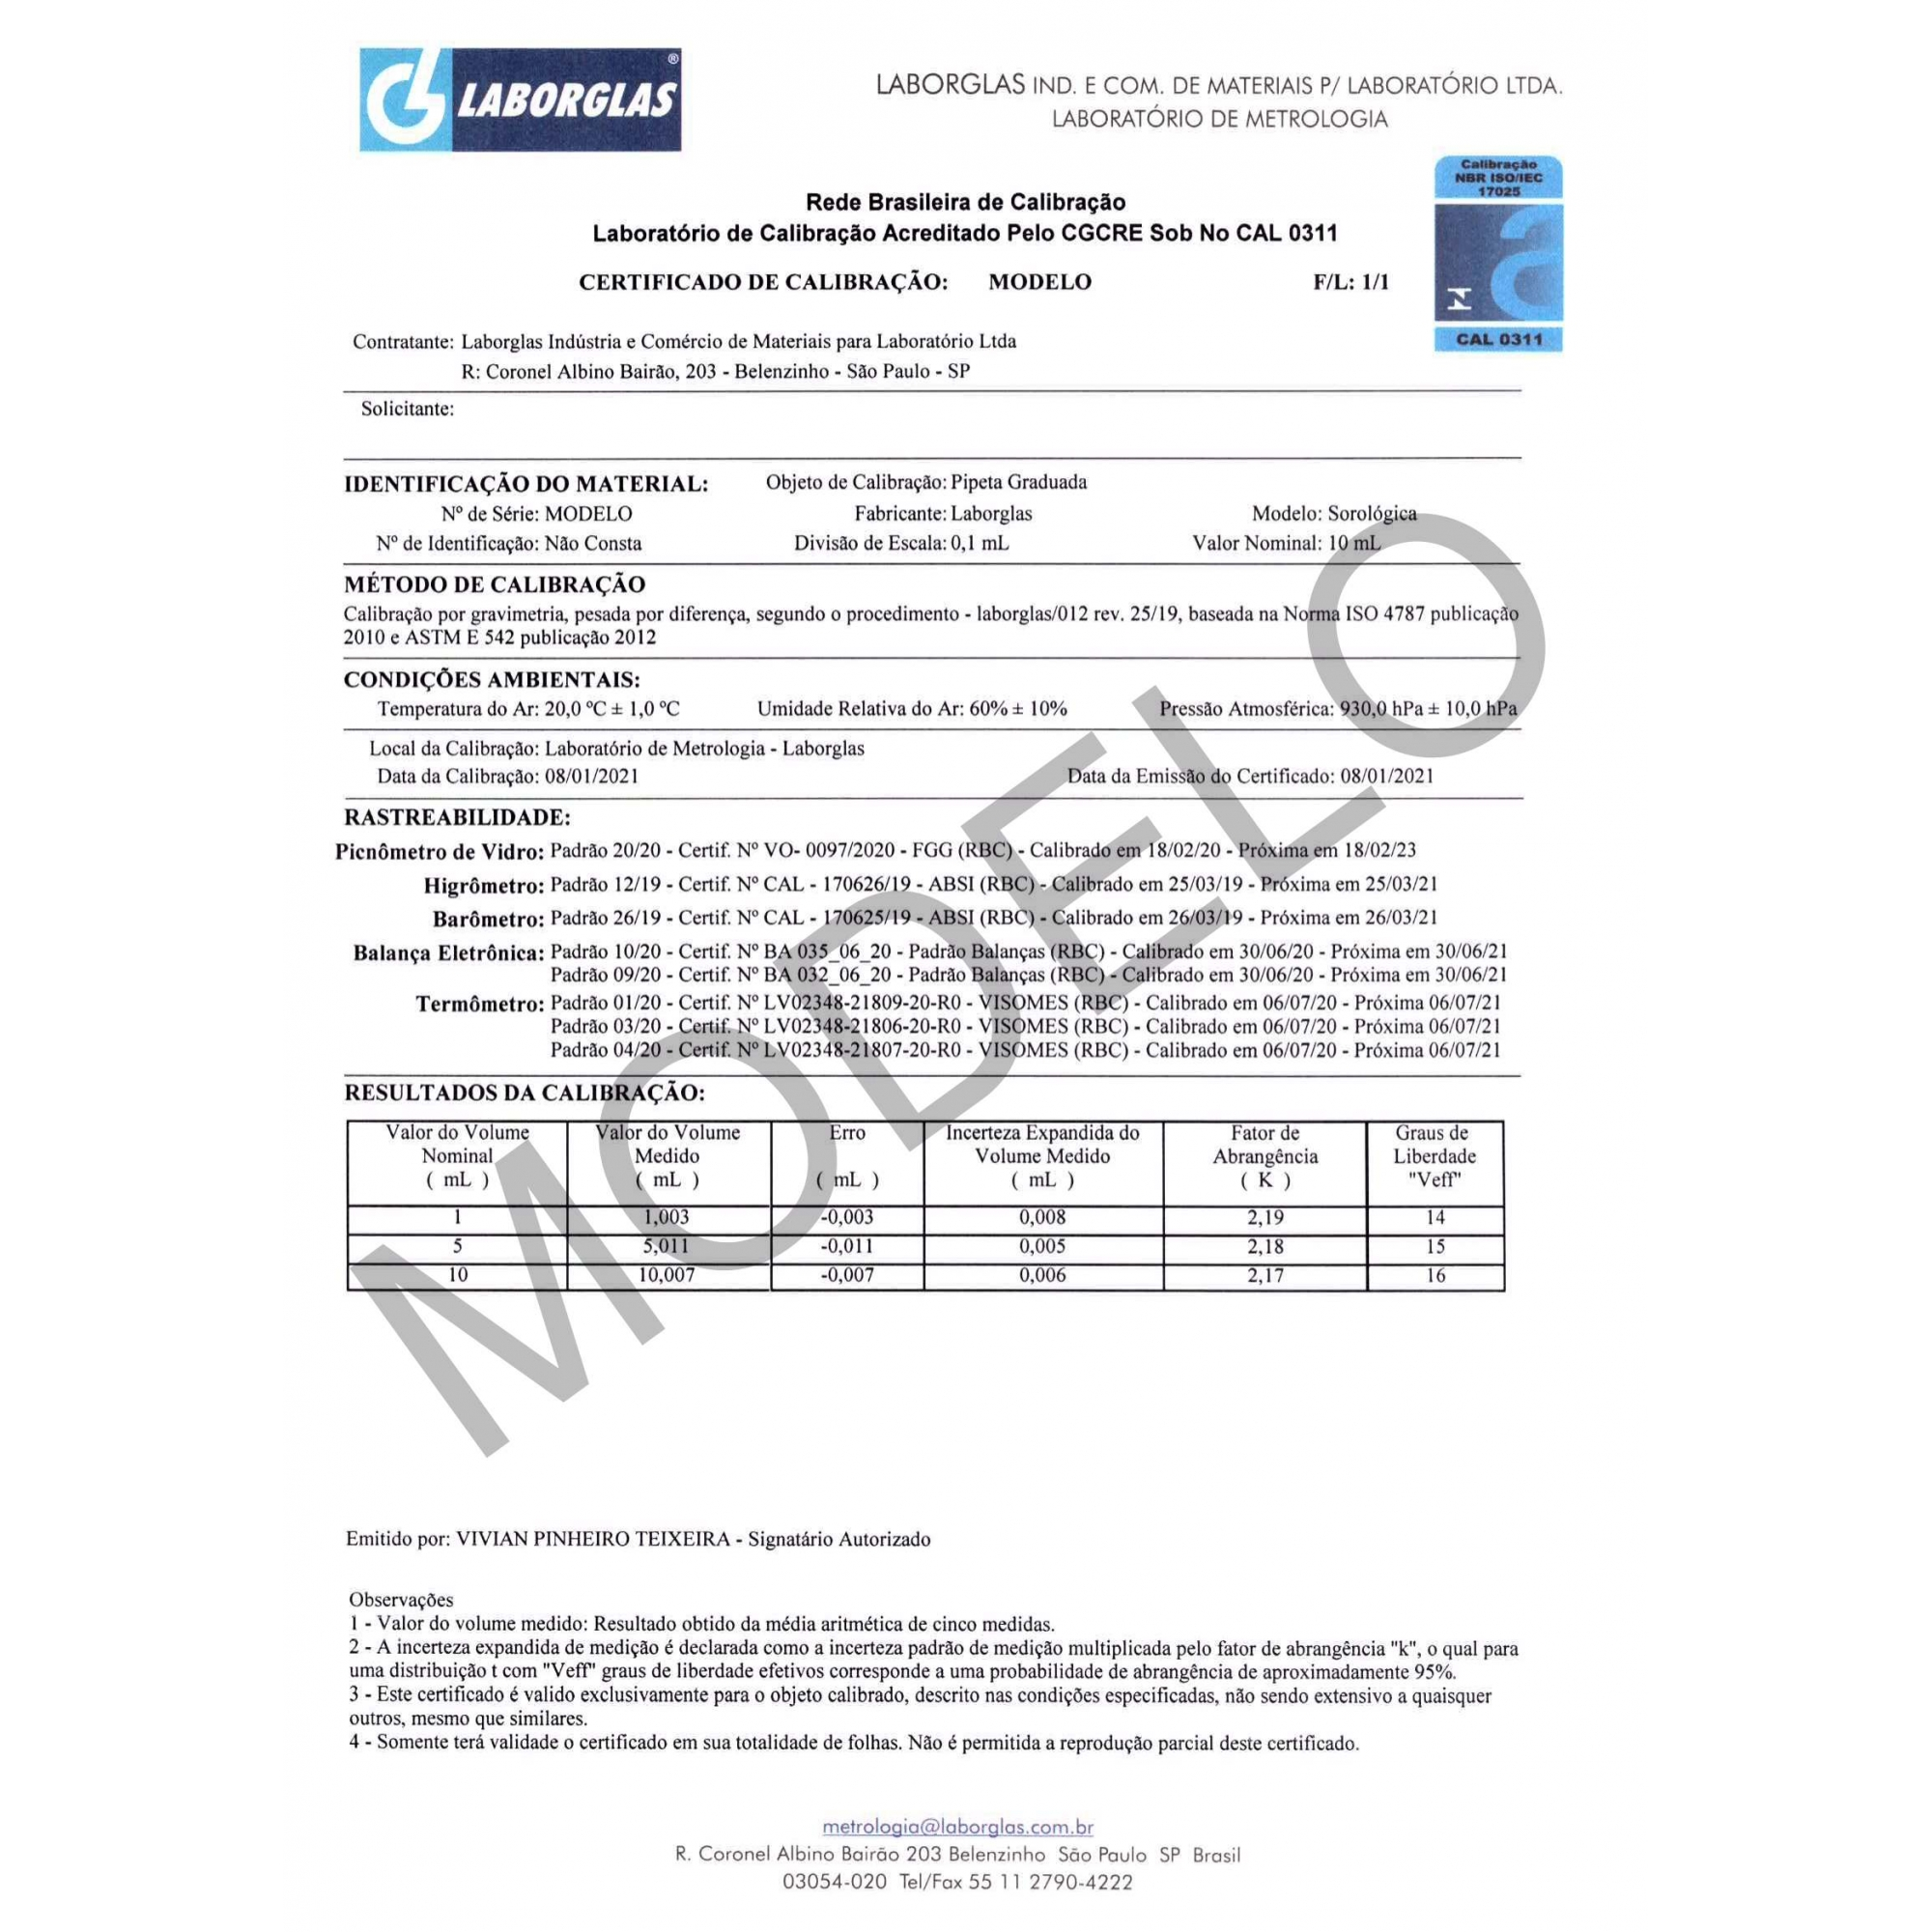 PIPETA GRADUADA SOROLÓGICA ESGOTOTAMENTO TOTAL 2 ML 1/100 CLASSE A COM CERTIFICADO RBC - Laborglas - Cód. 9443609-R